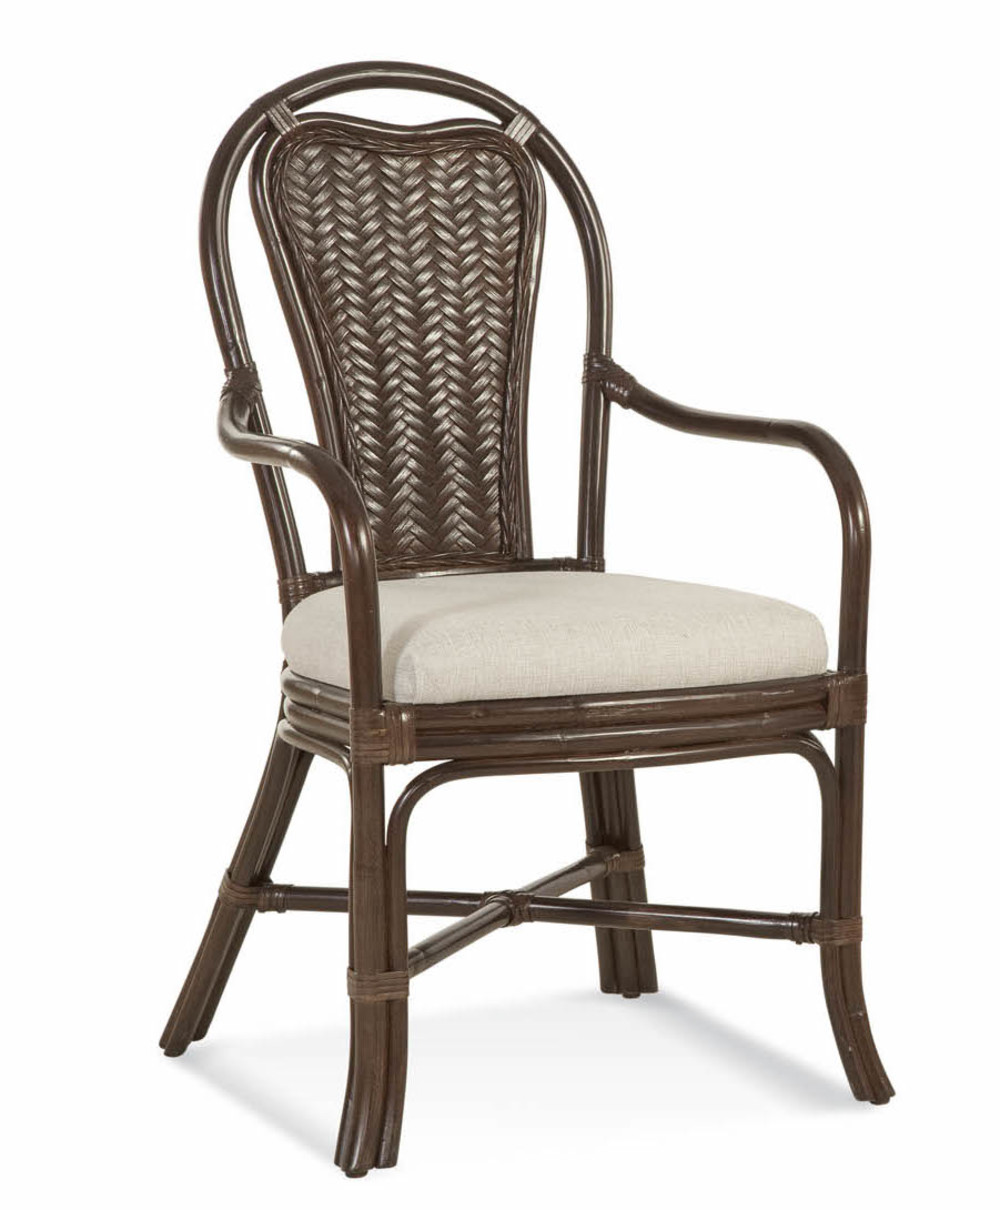 Braxton Culler - Acapulco Arm Chair